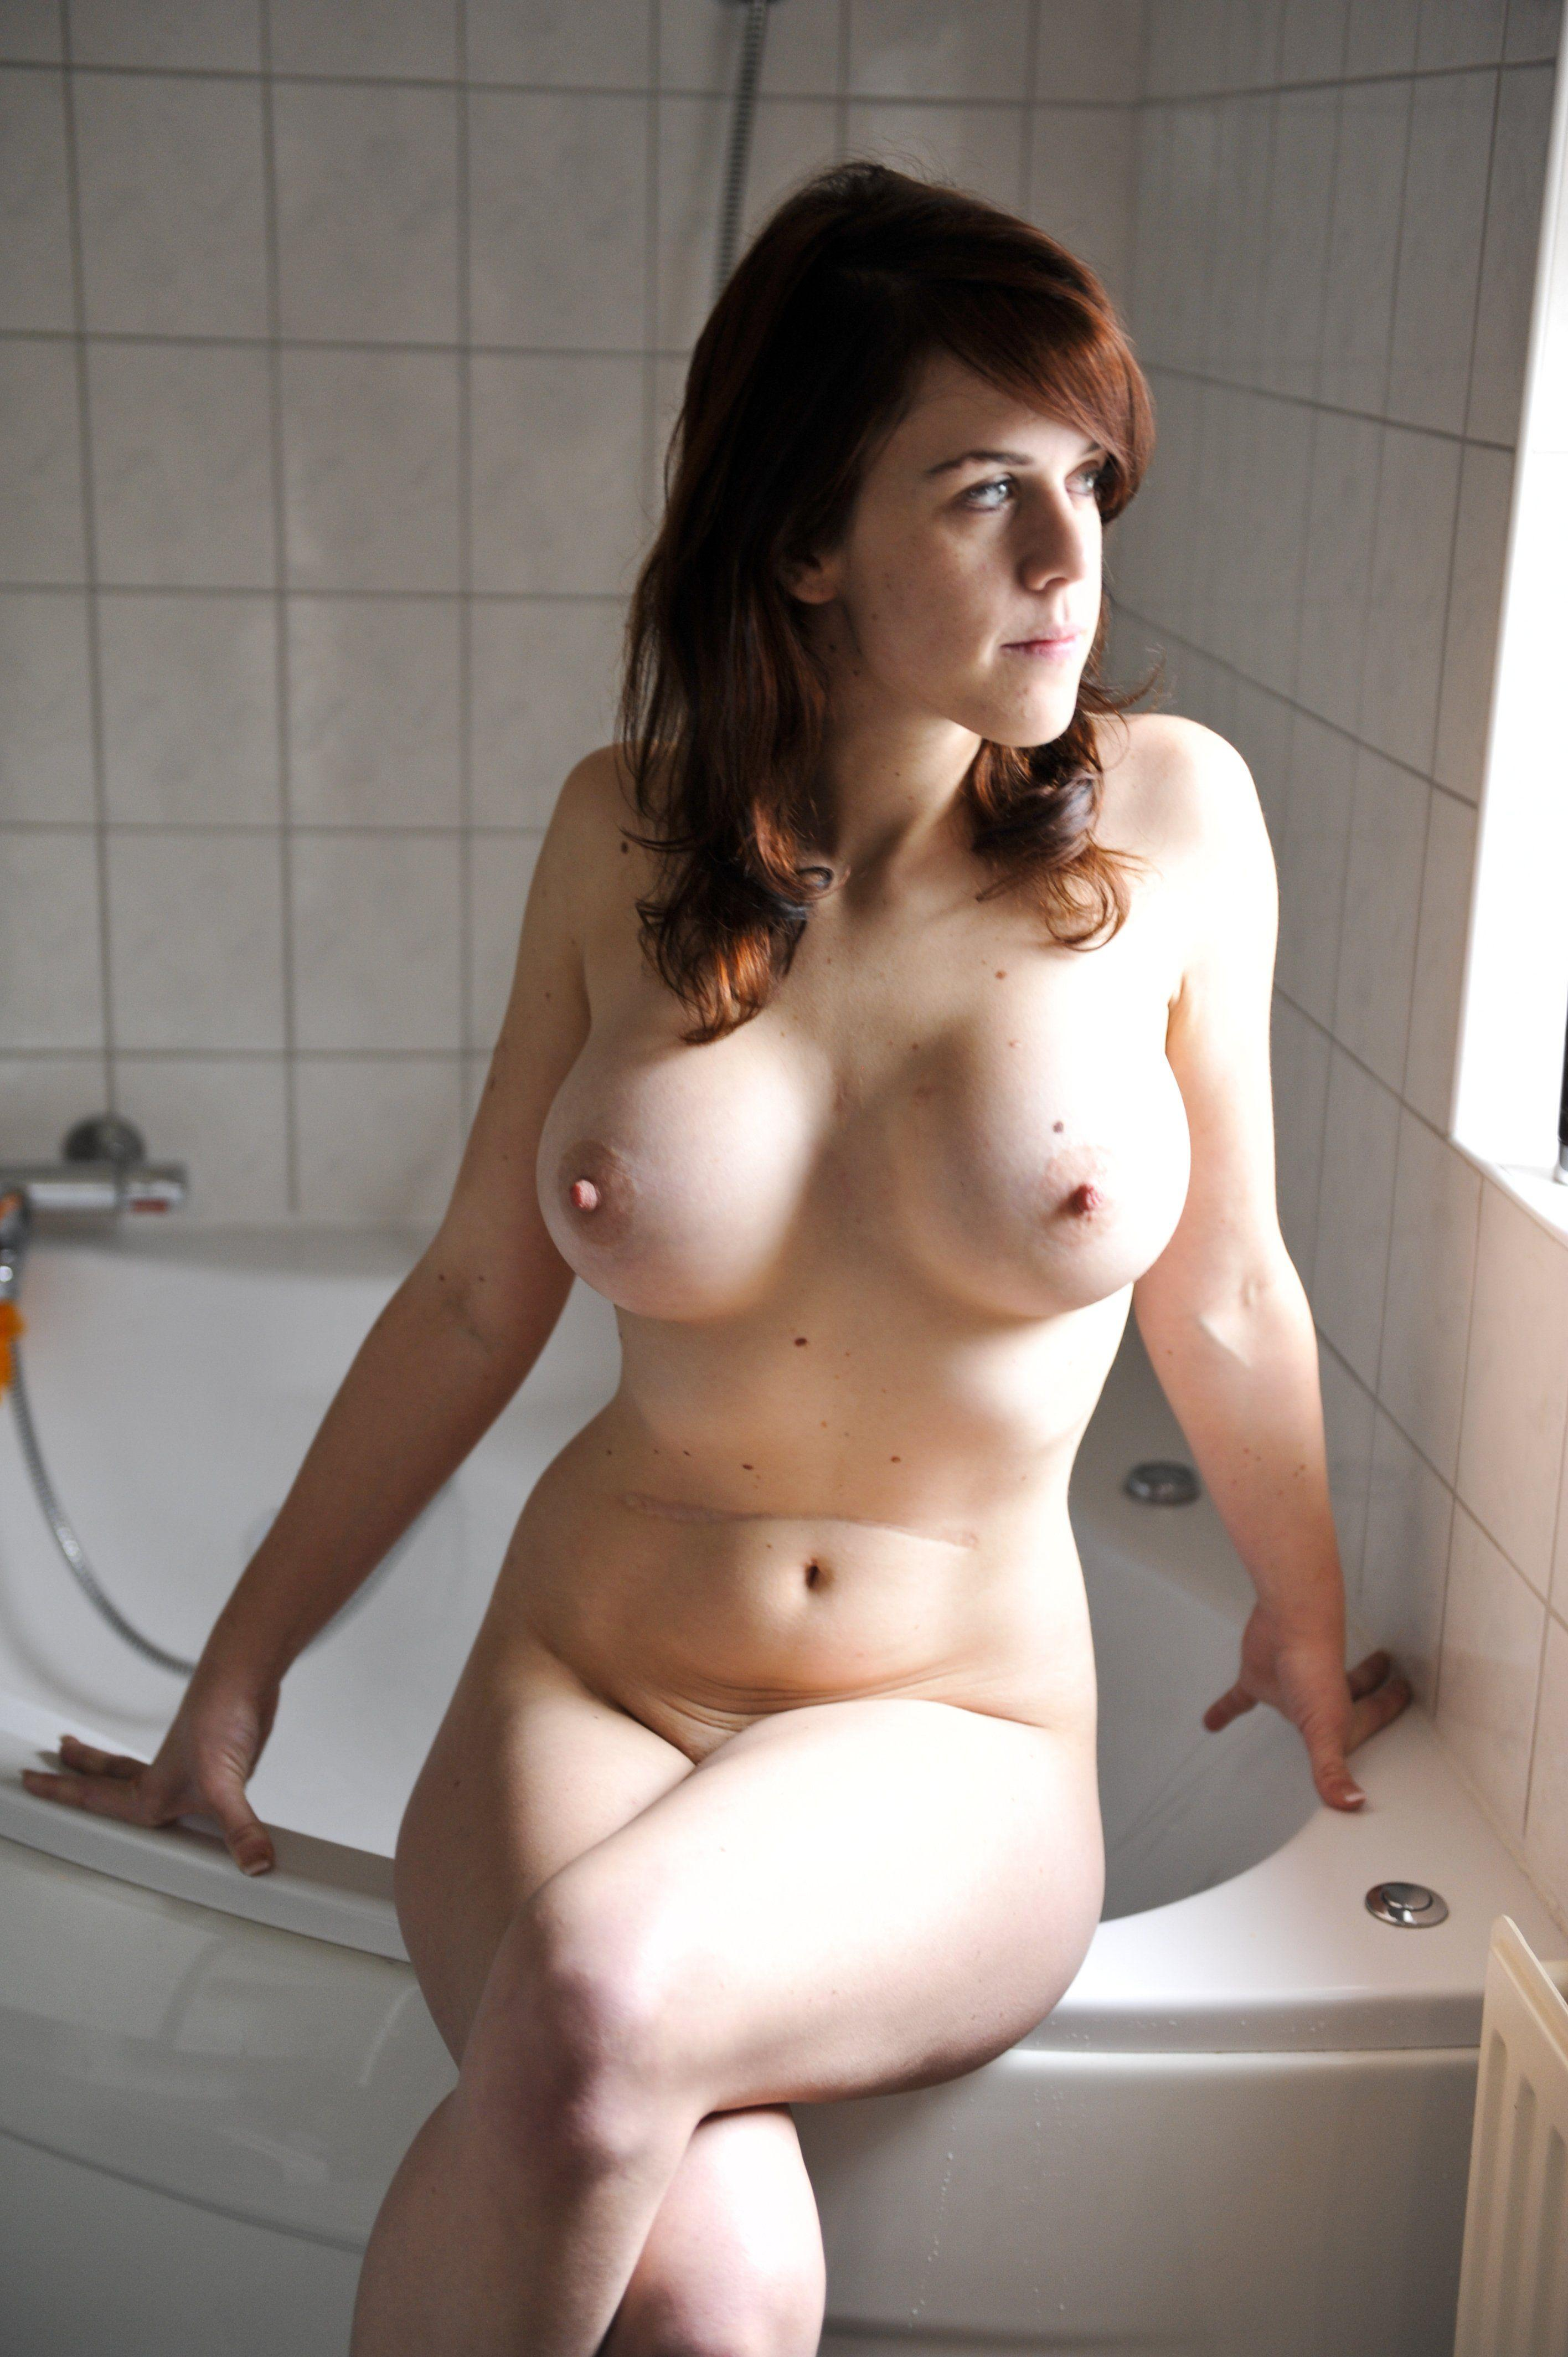 Anateur nudes